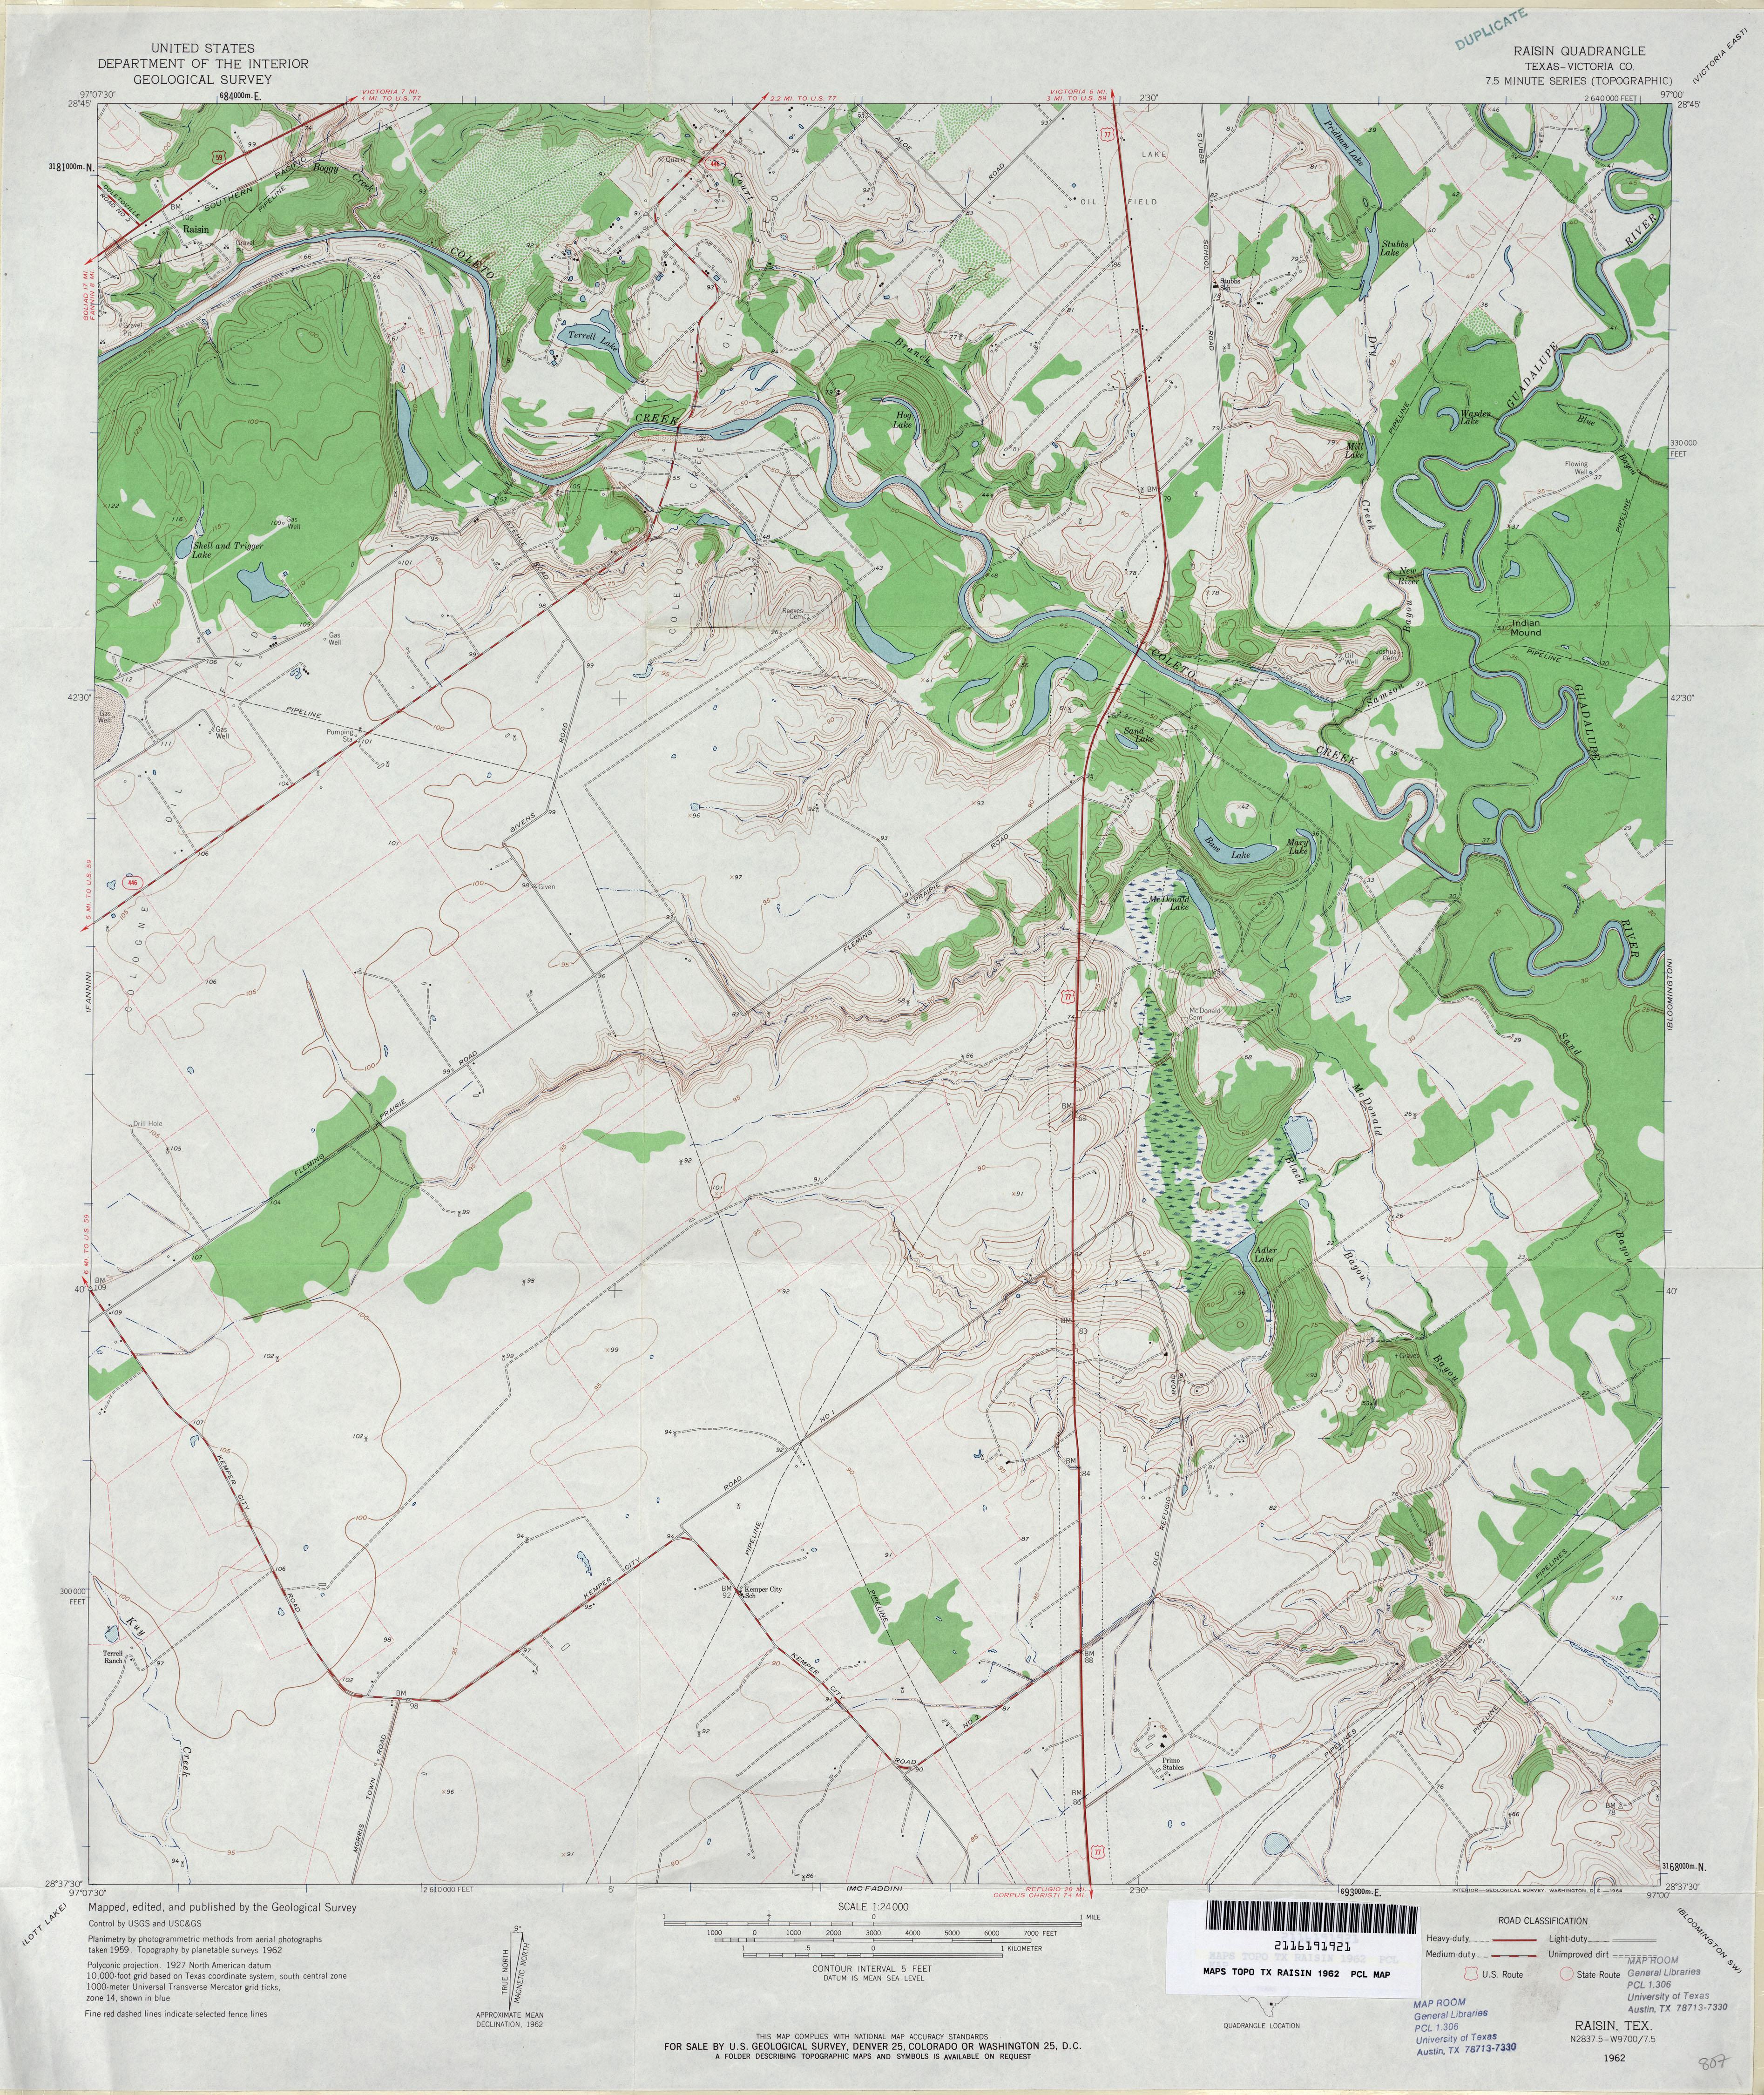 Elegant Texas Topographic Map Bnhspinecom - Texas topographic maps free